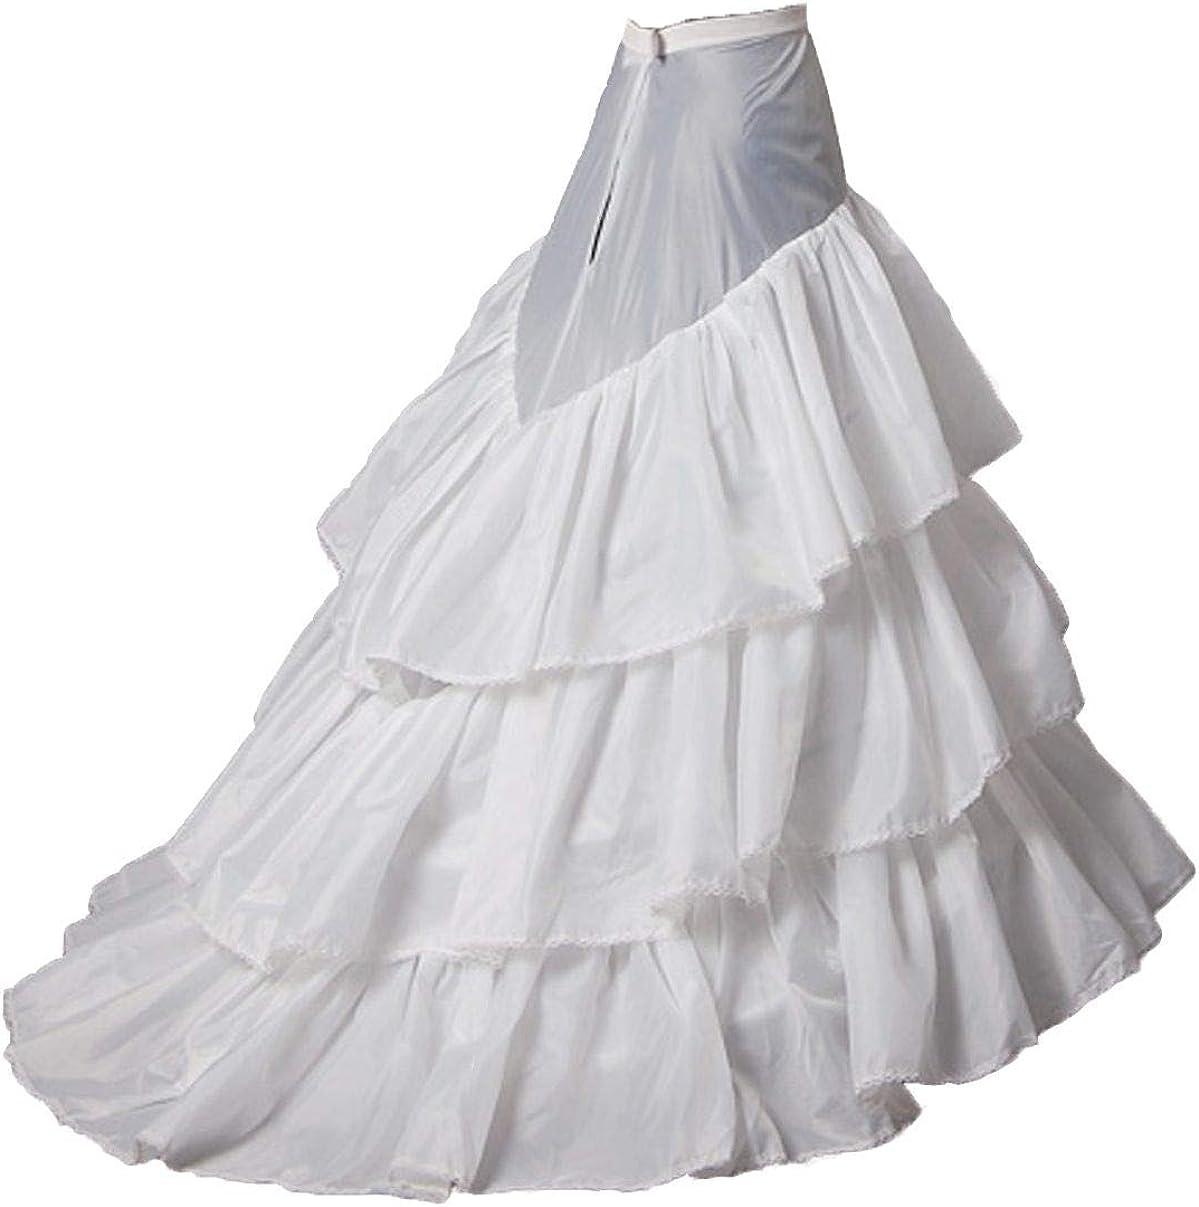 Snowskite Womens 2 Hoops Train Wedding Dress Bridal Gown Petticoat White